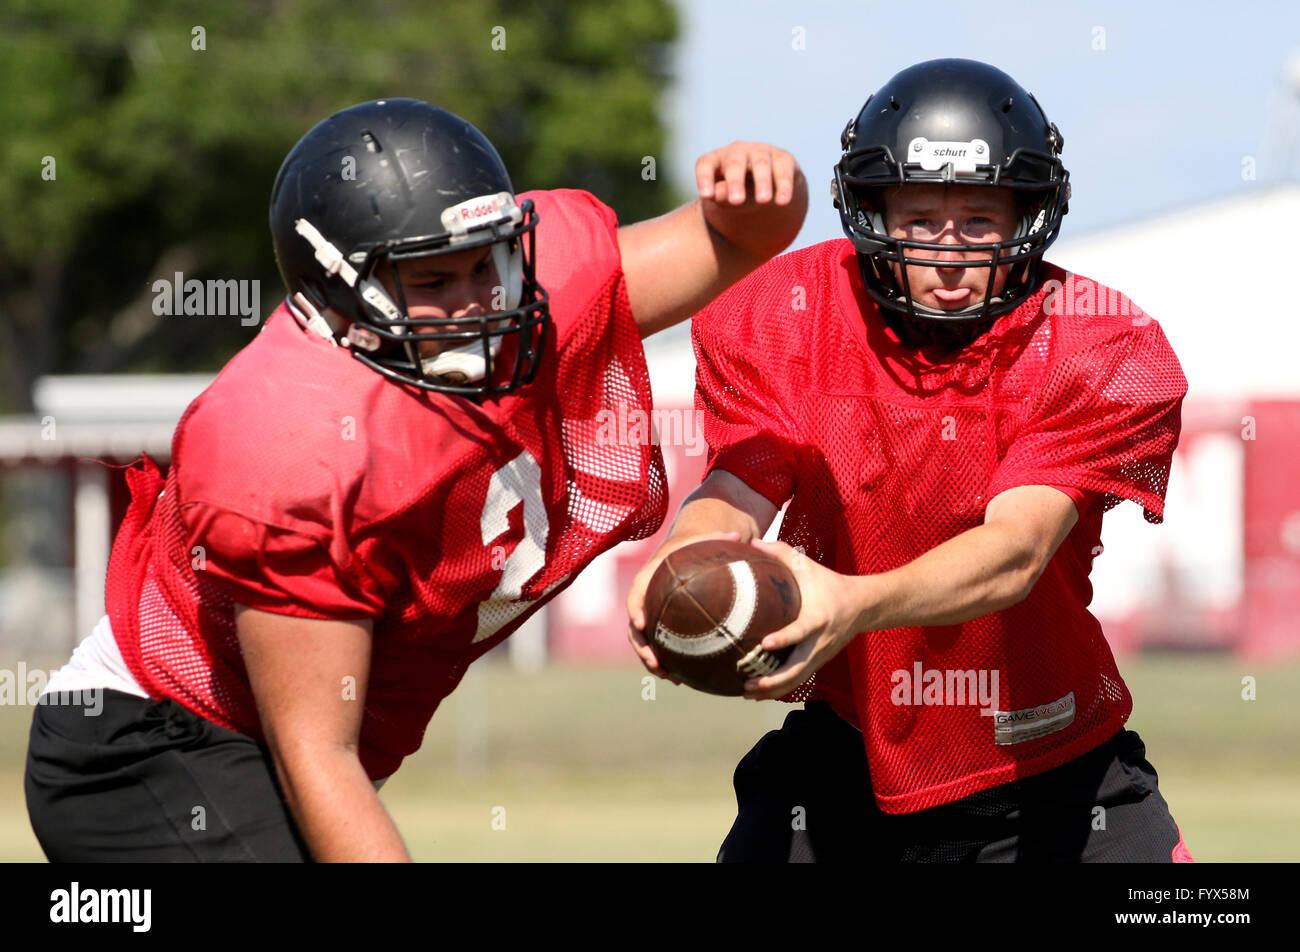 Dunedin, Florida, USA. 28th Apr, 2016. DOUGLAS R. CLIFFORD | Times.Dunedin Falcons head quarterback Tyler Palermiti - Stock Image